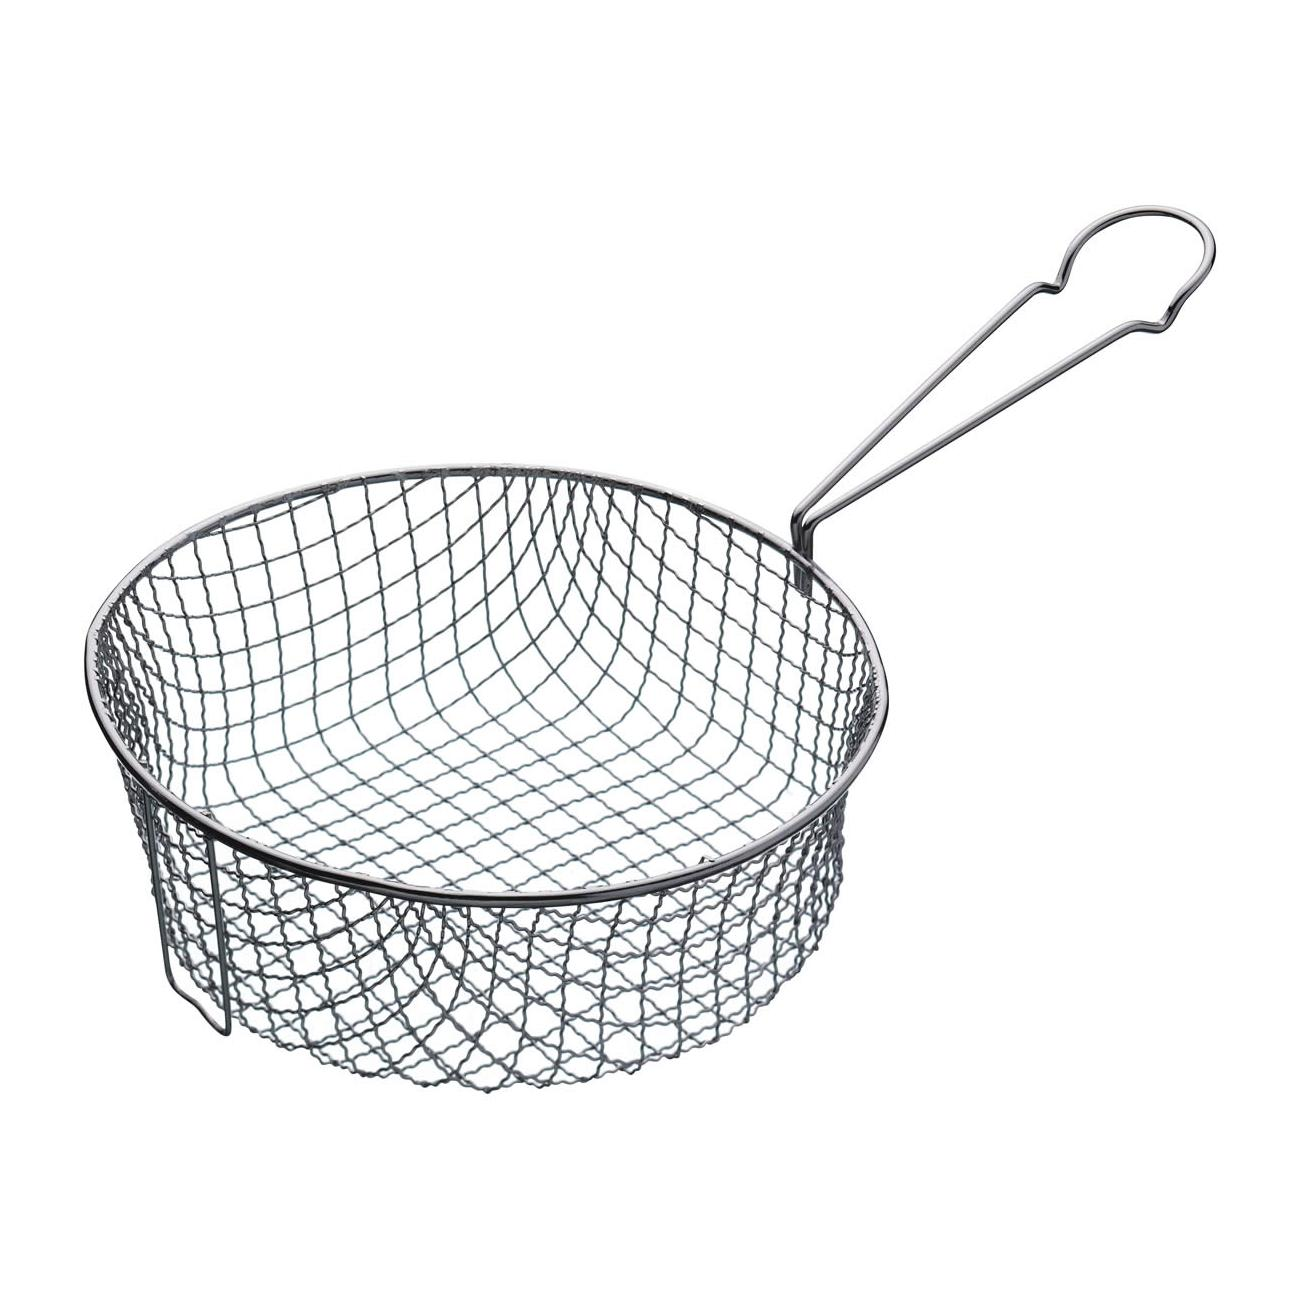 1300x1300 Kitchencraft Wire Deep Fryer Basket, 20 Cm (To Fit 22 Cm Chip Pan